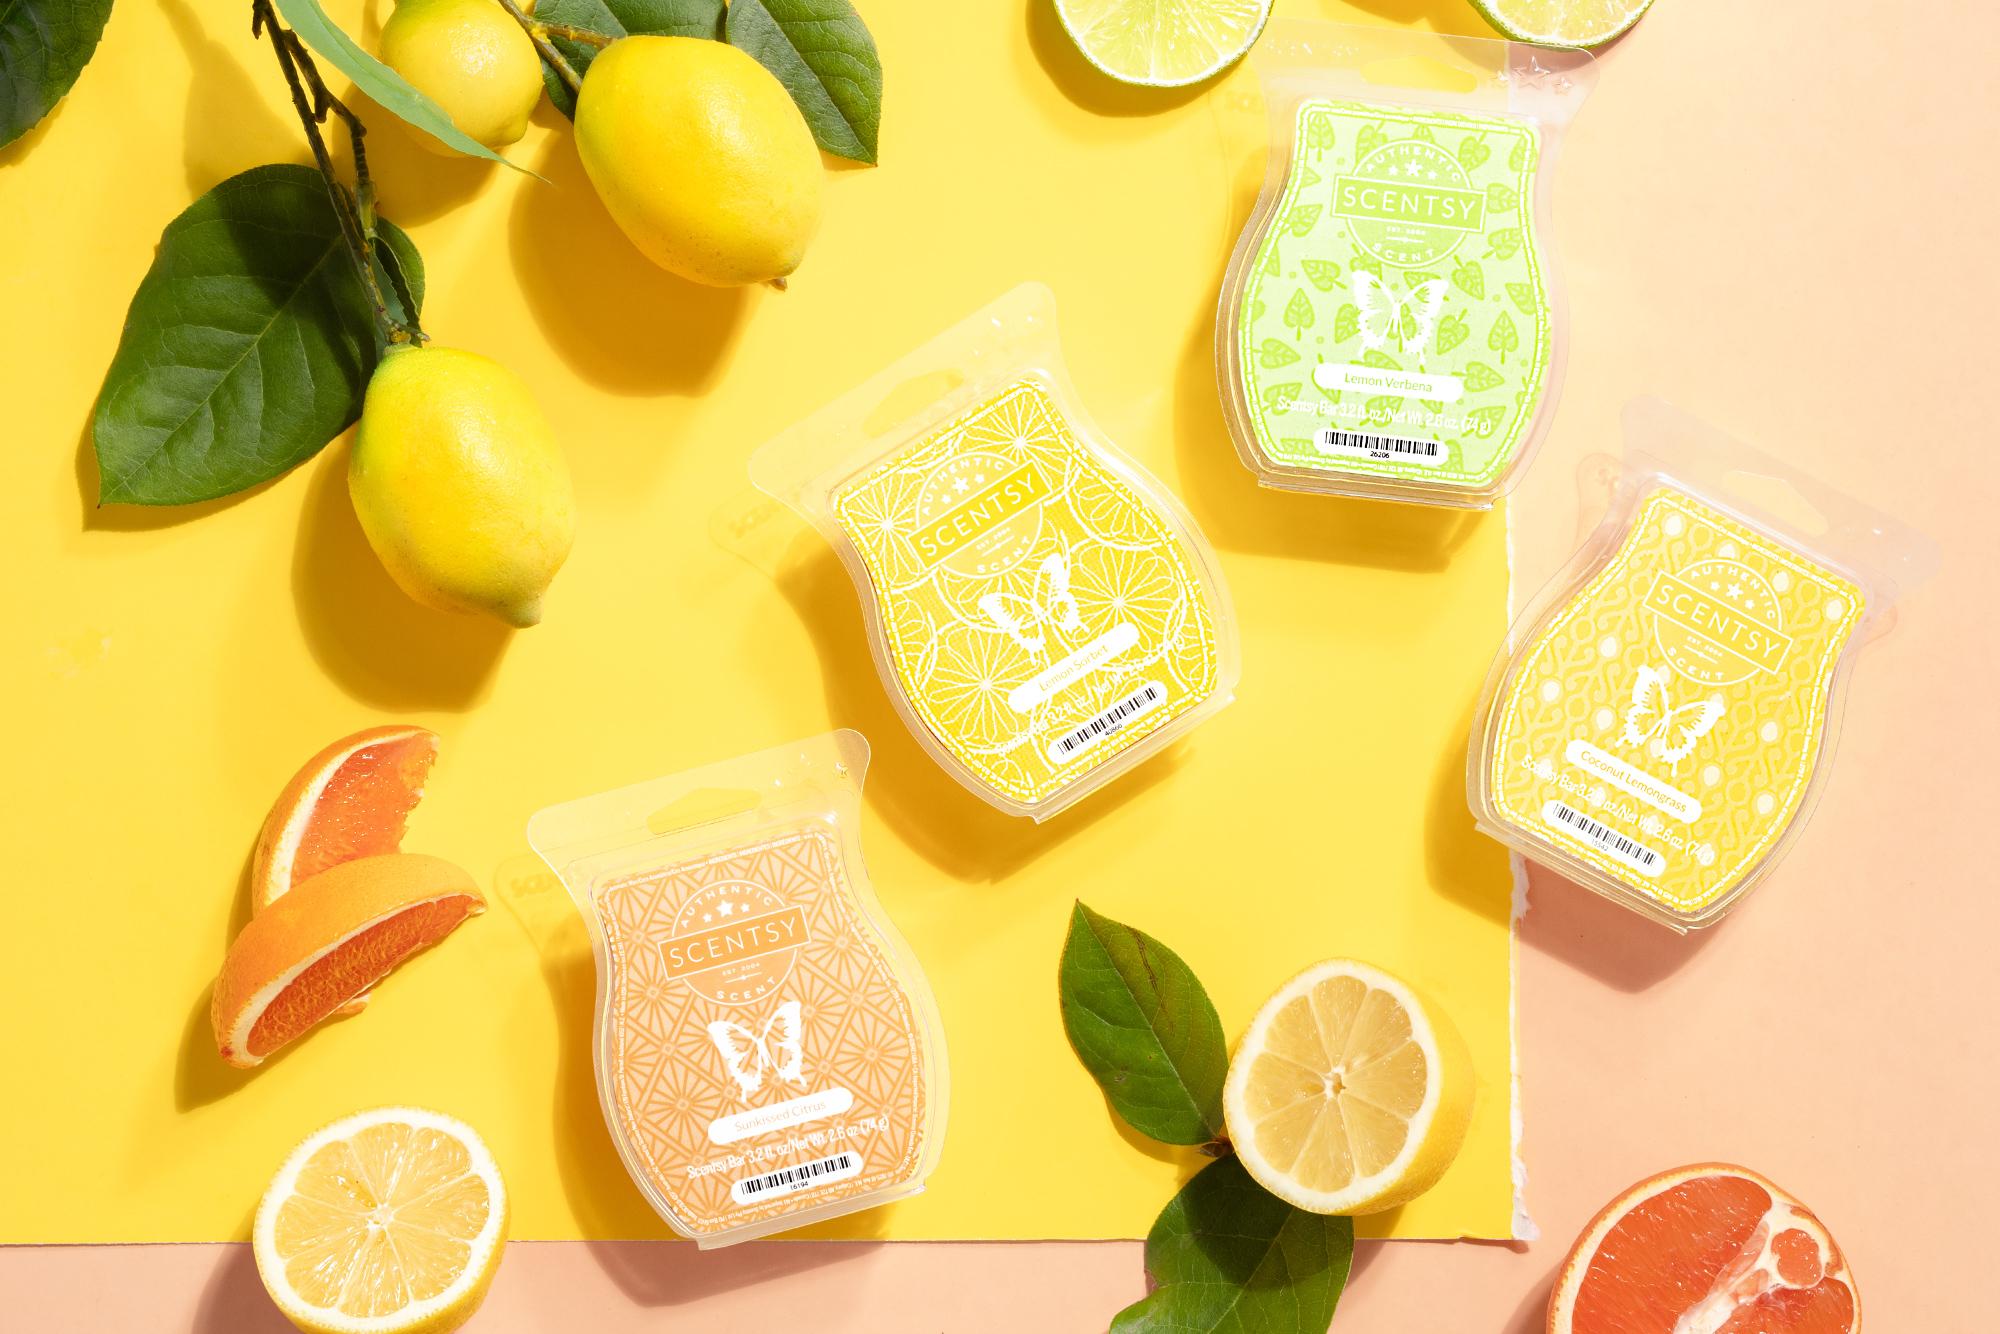 Citrus fragrance family wax bars